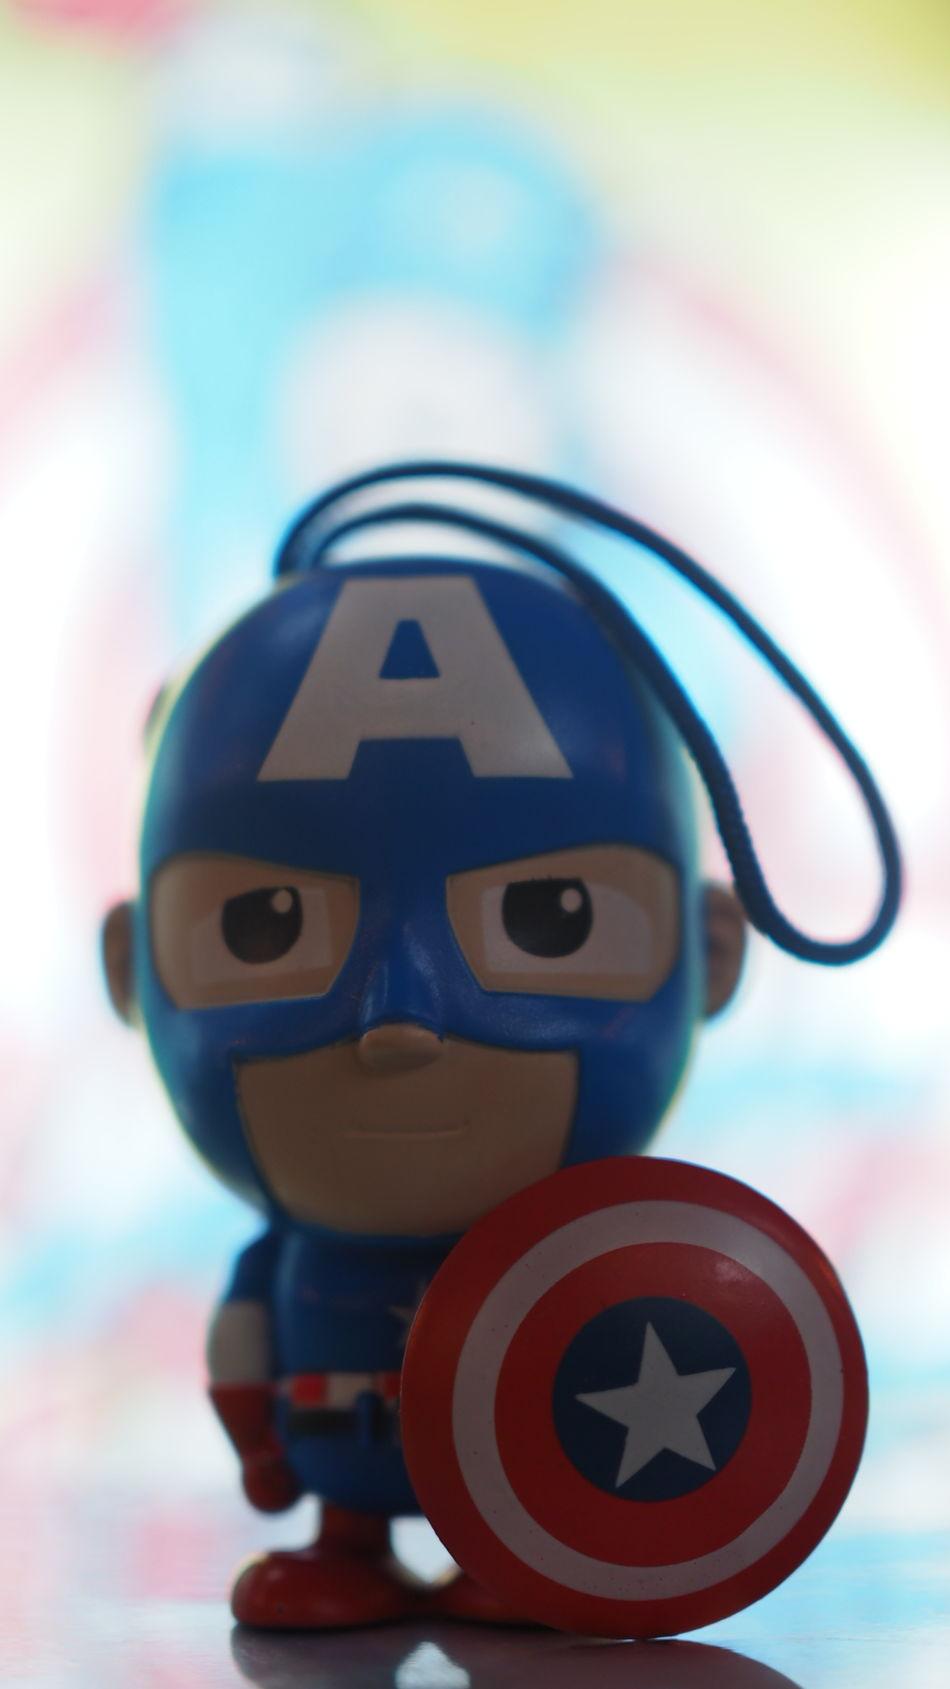 Teamcap Teamcaptainamerica Captianamerica Civil War Marvel Comics Taking Photos Photography Mirrorless Olympus Om-d E-m10